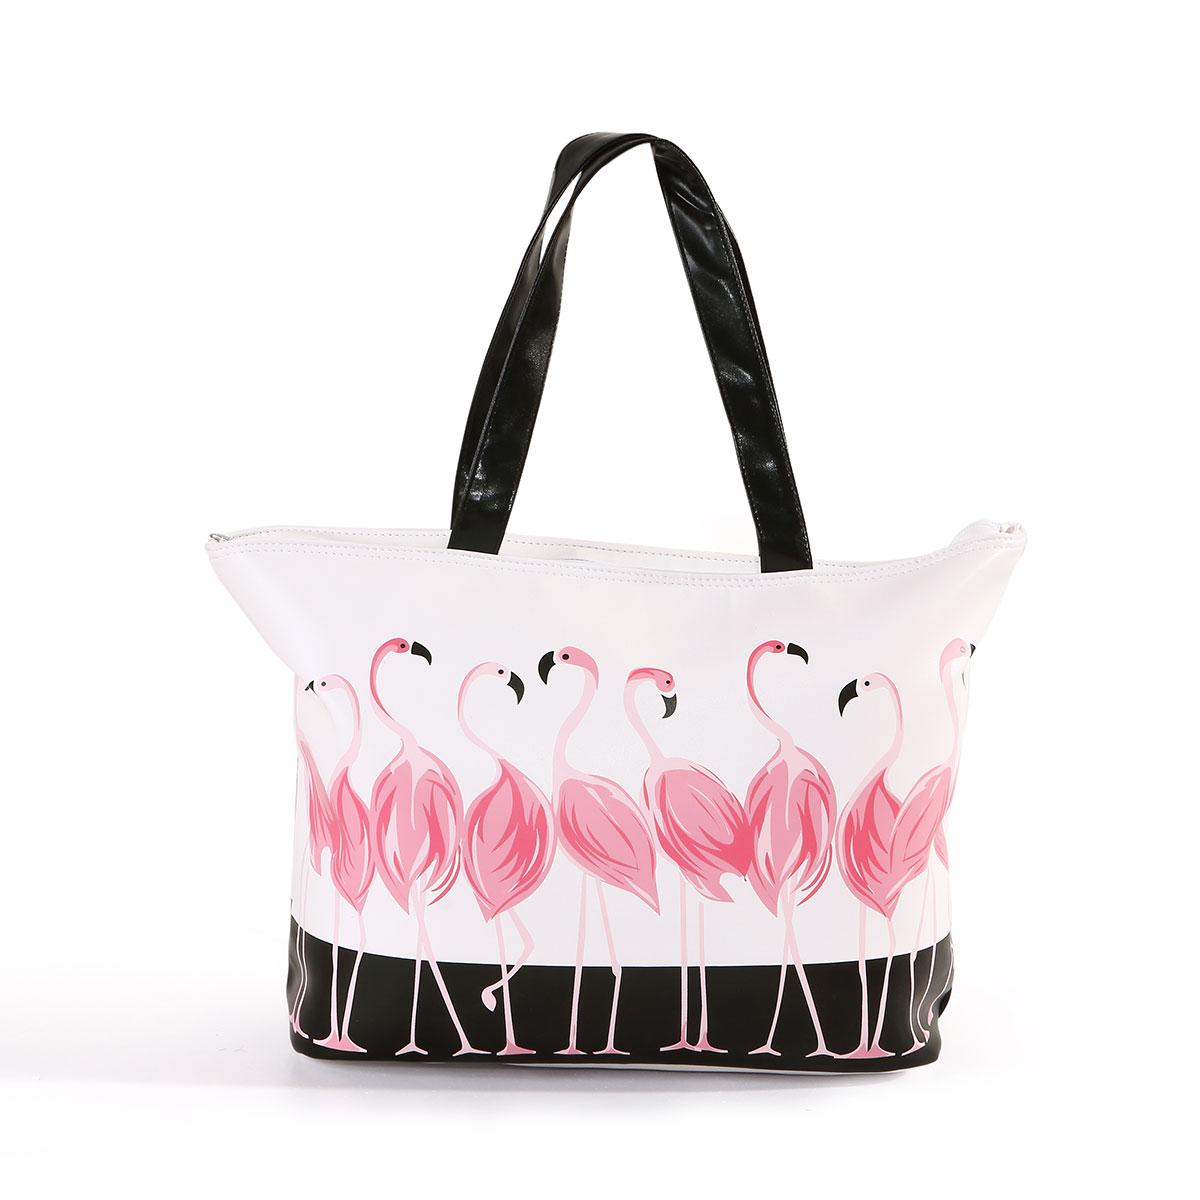 Mercury Textile Flamingo Women Bag Handbag European And American Fashion Trend Hand 2017 New